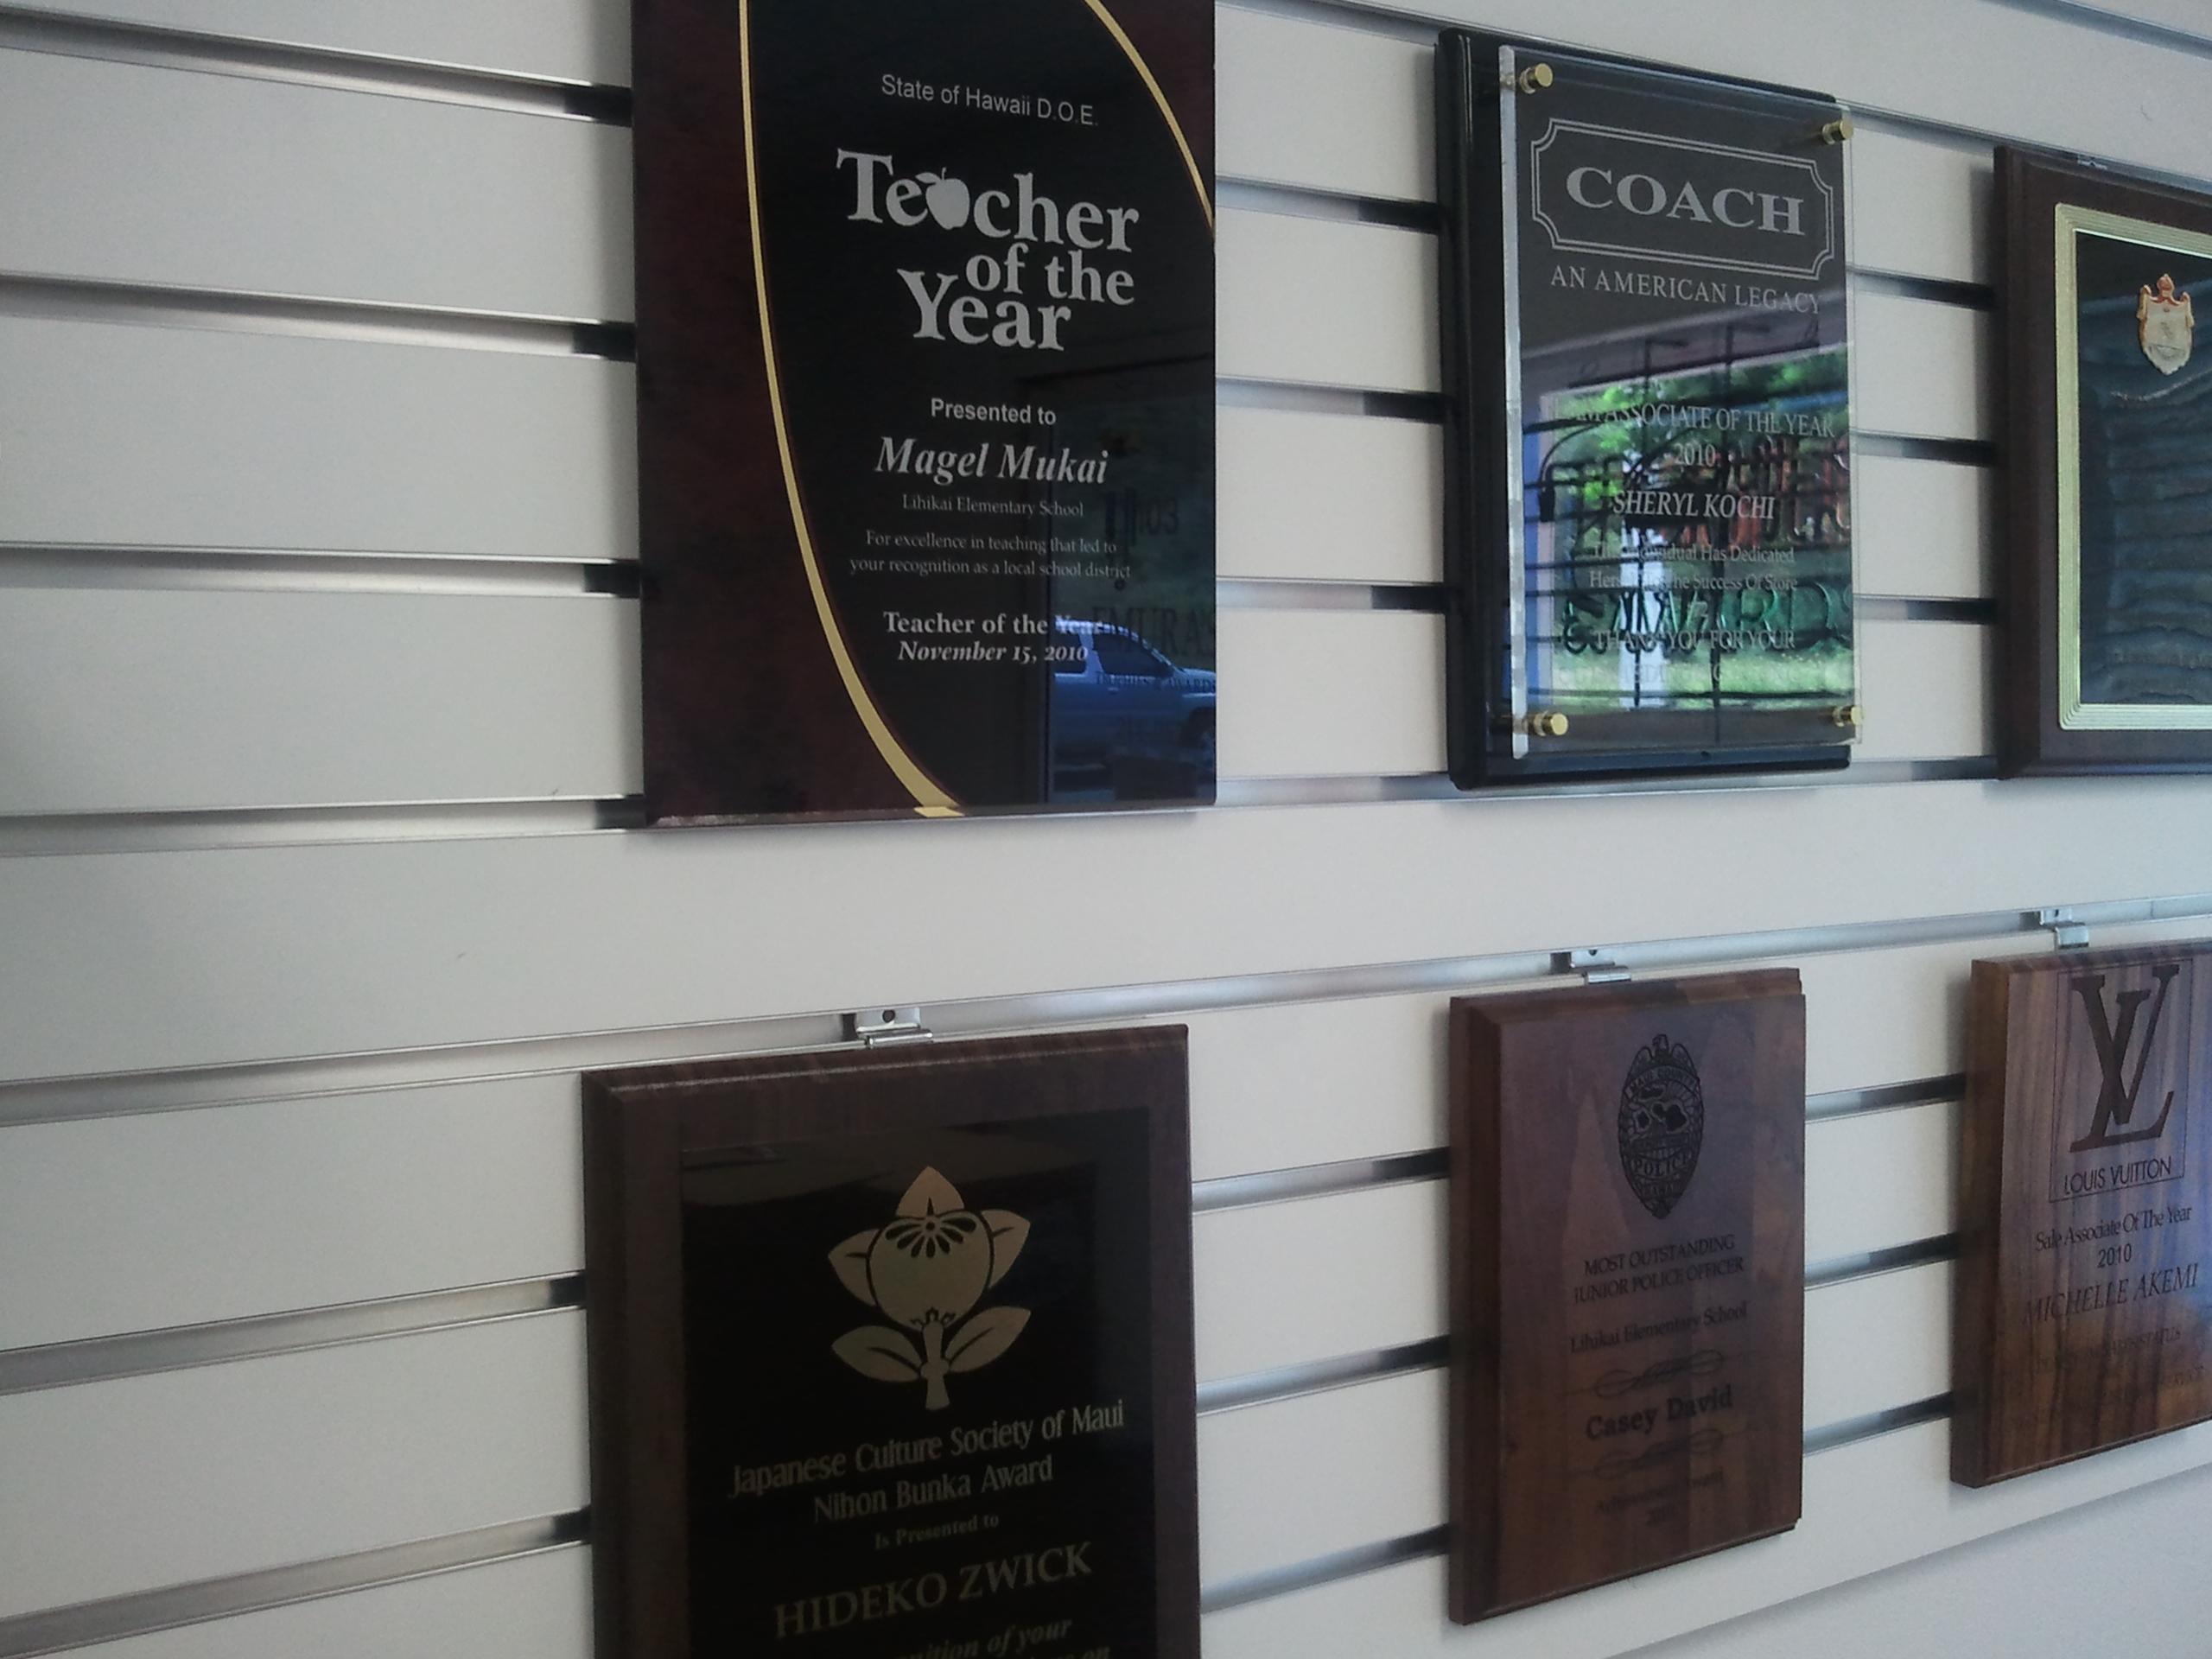 Plaques awards plaques maui awards maui wall plaque maui hawaii